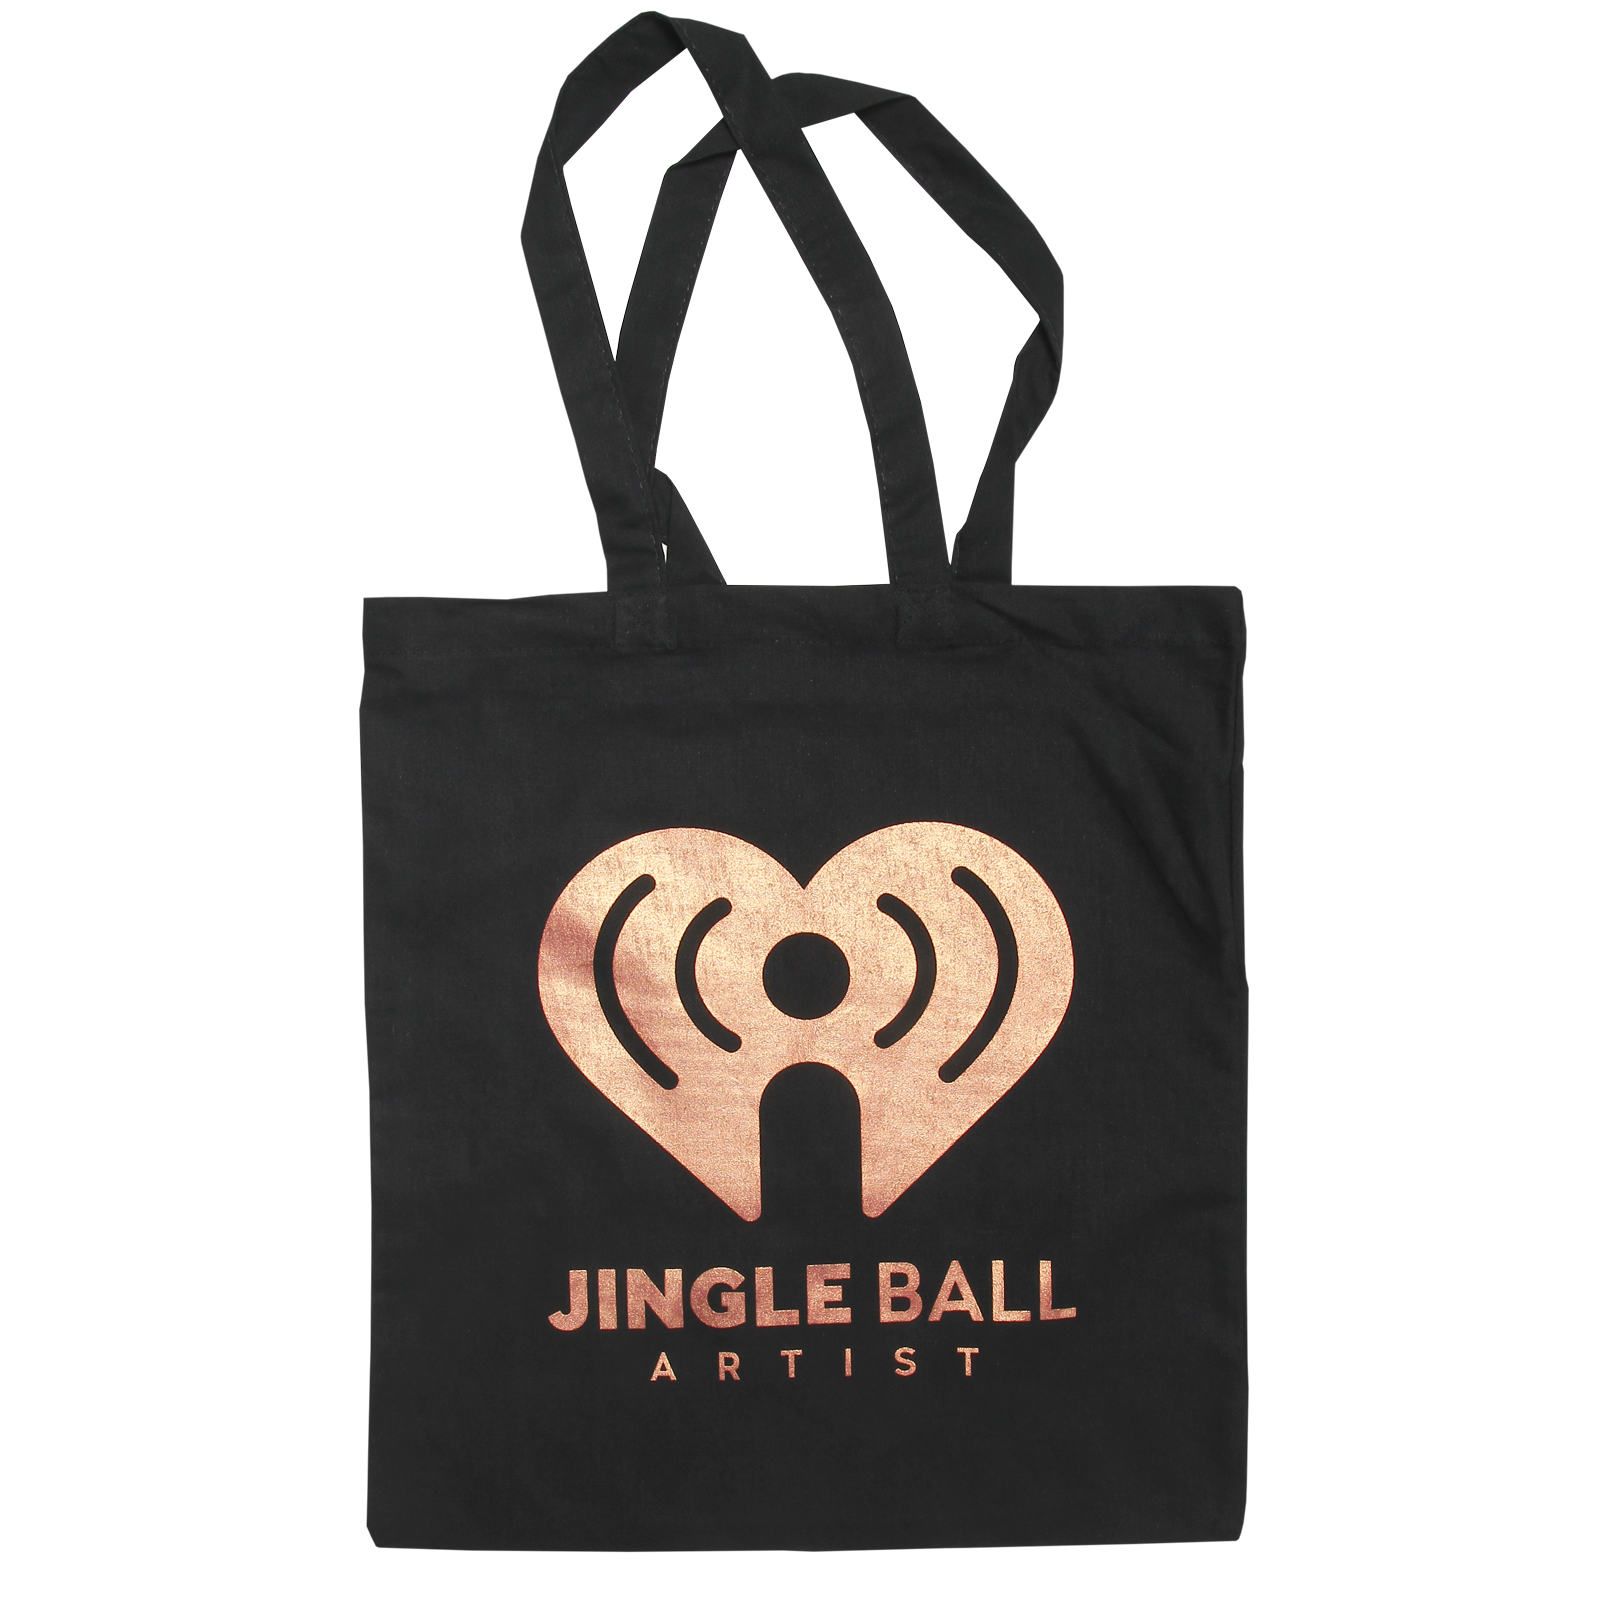 2018 Jingle Ball Tour Tote Bag